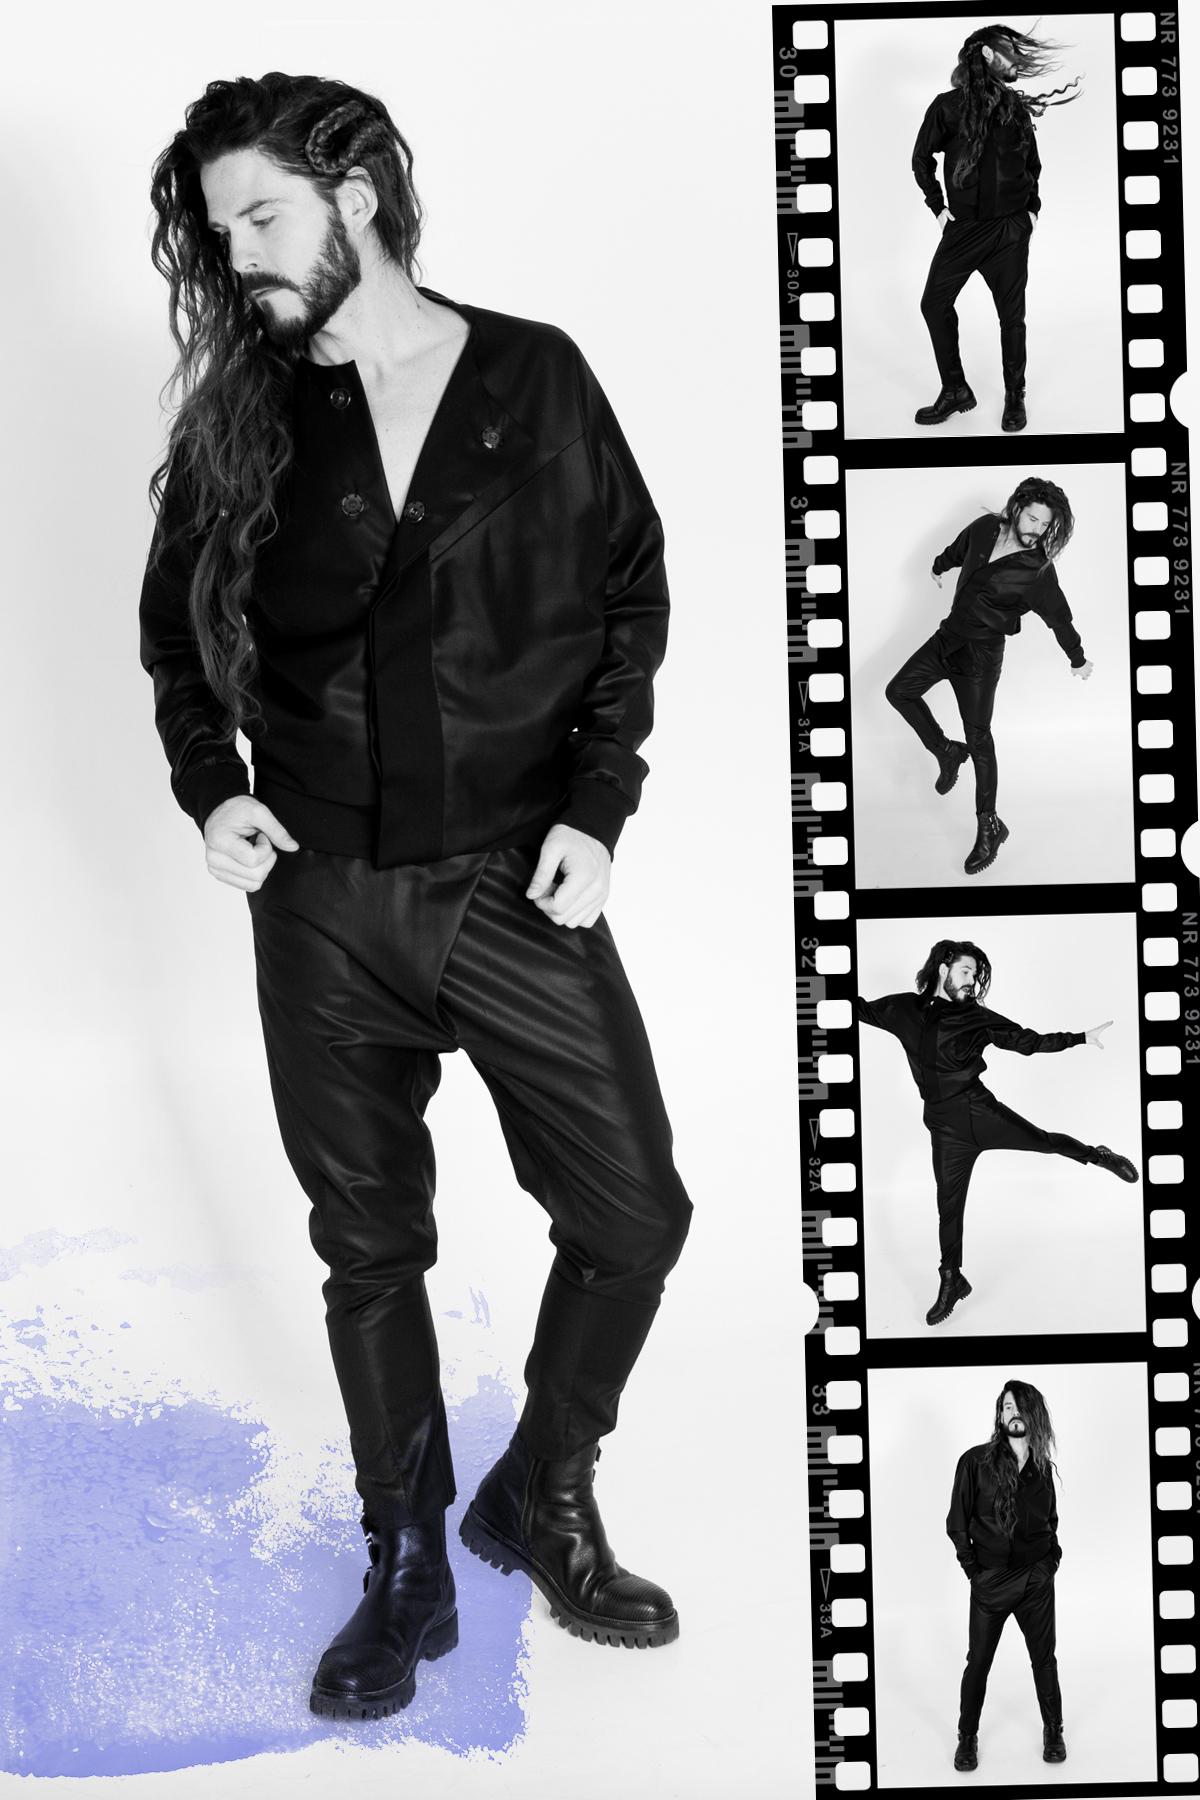 Editorial-Aleks-Kurkowski-Malefashion-Designer-Mode-High-Fashion-Avantgarde-Menswear-03